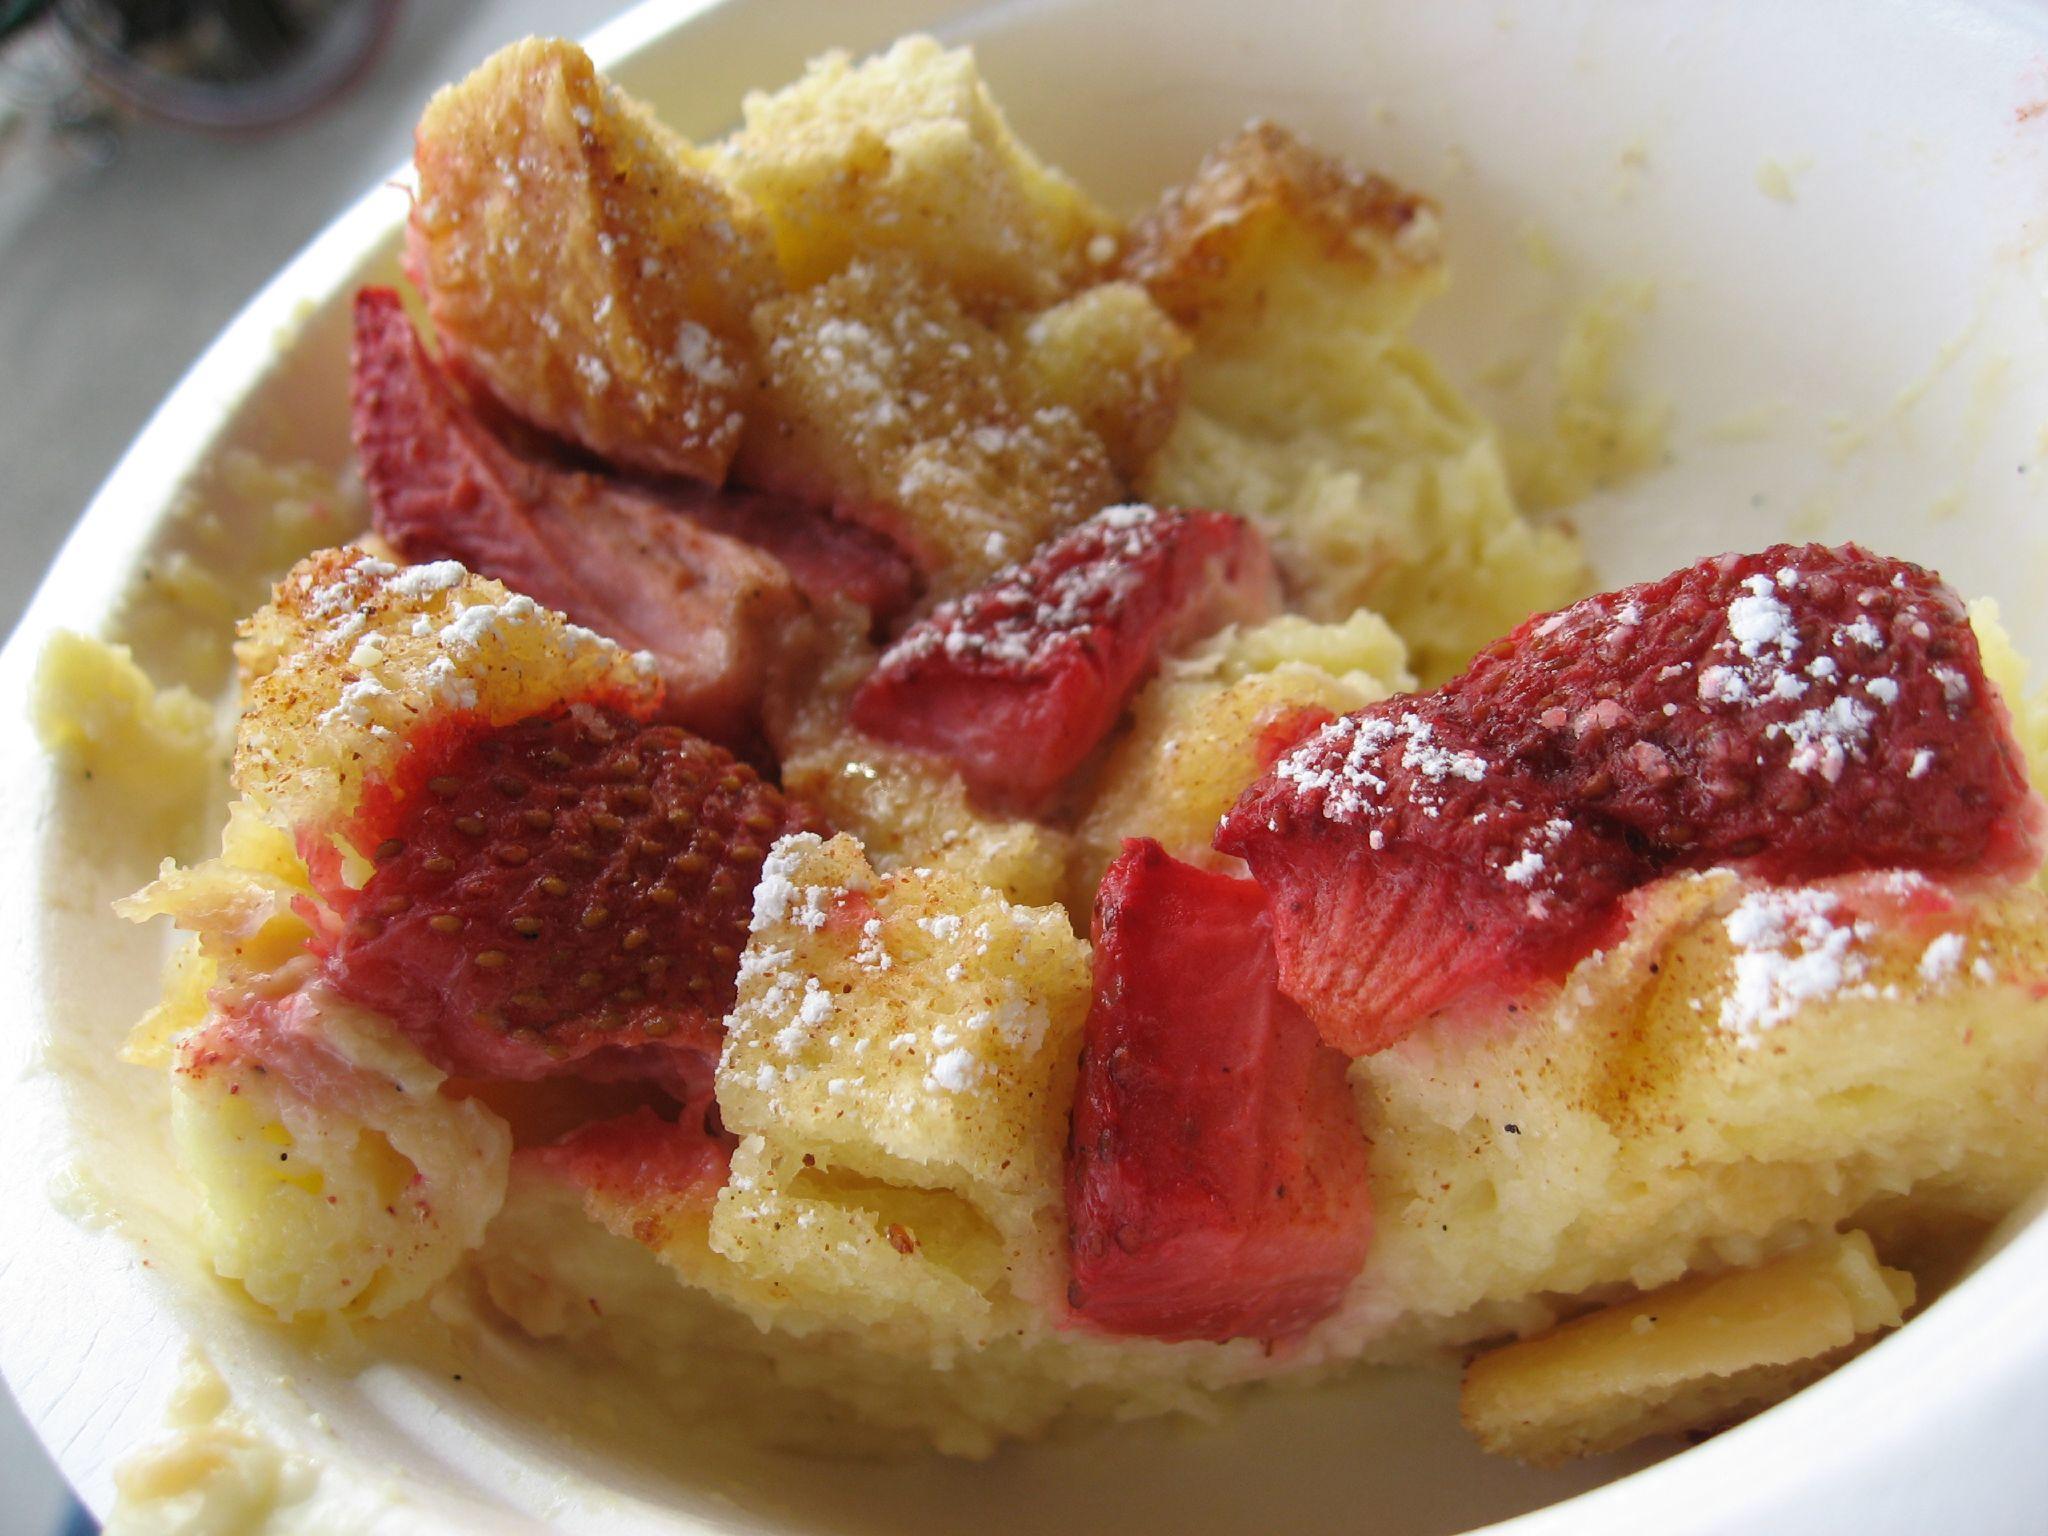 Scrumptious_strawberry_bread_pudding.jpg